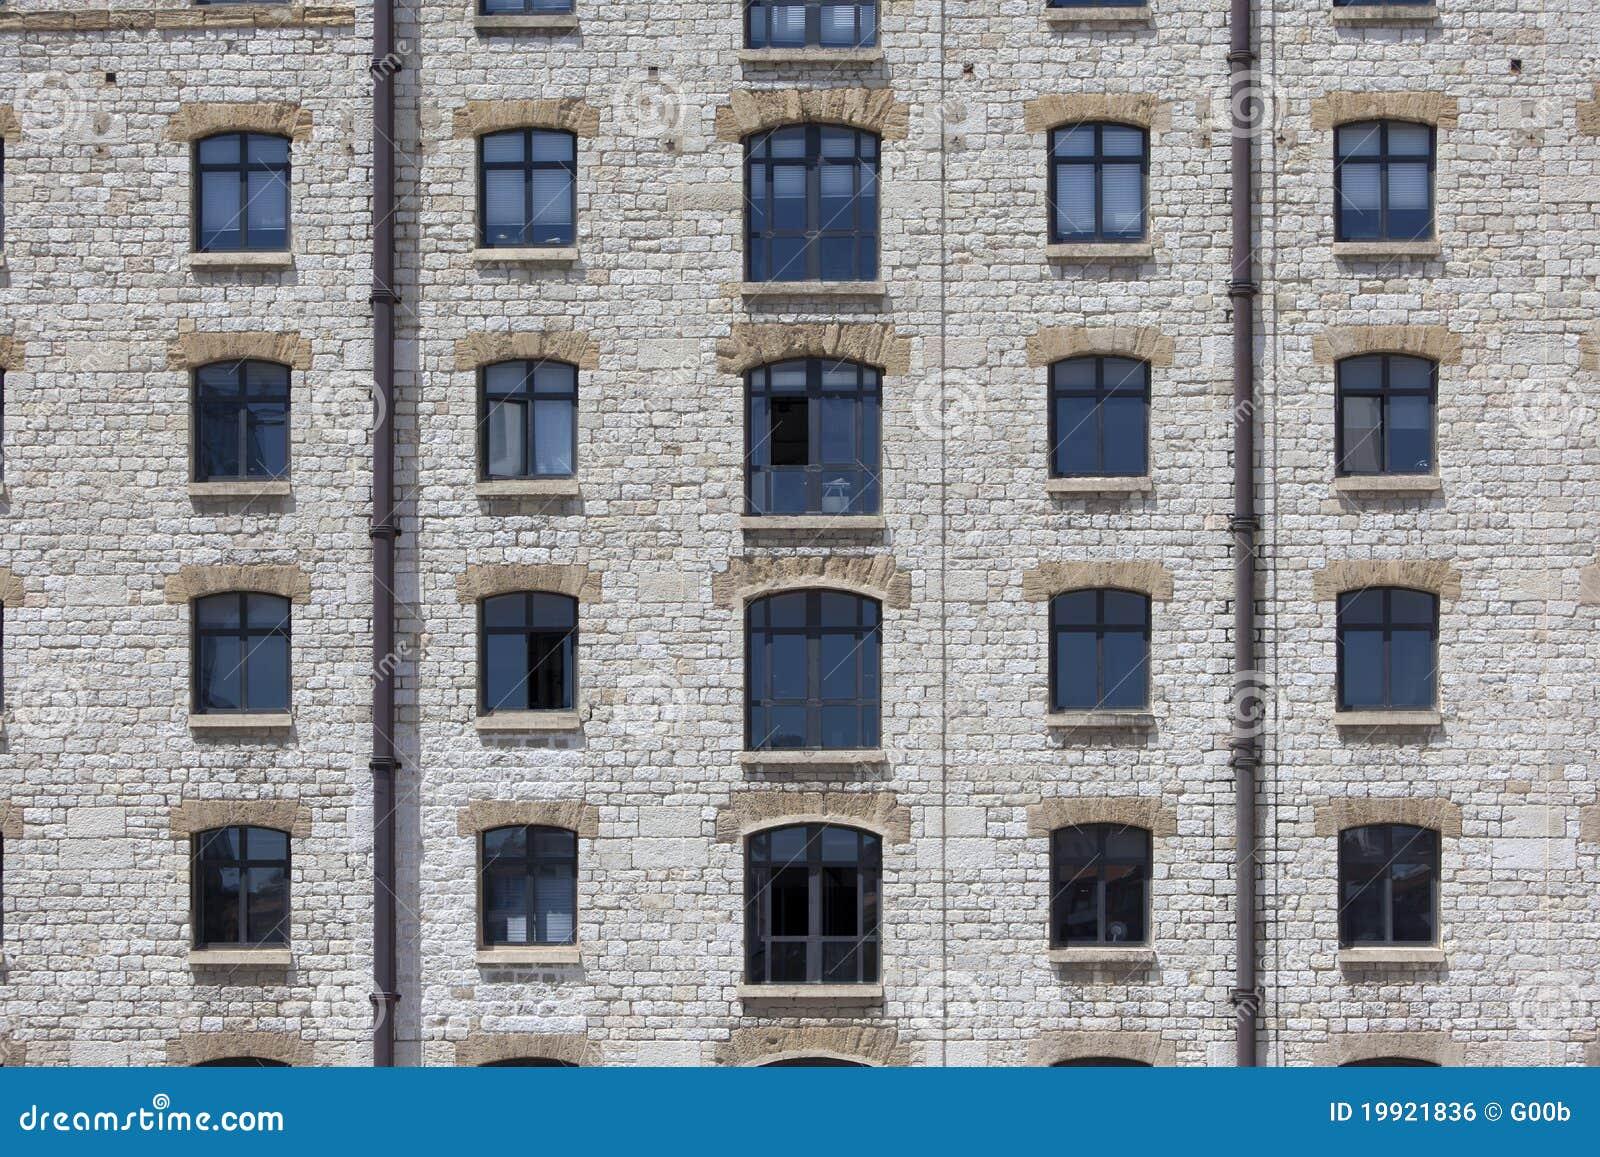 Stone Building Facade : Facade of an old stone building royalty free stock image